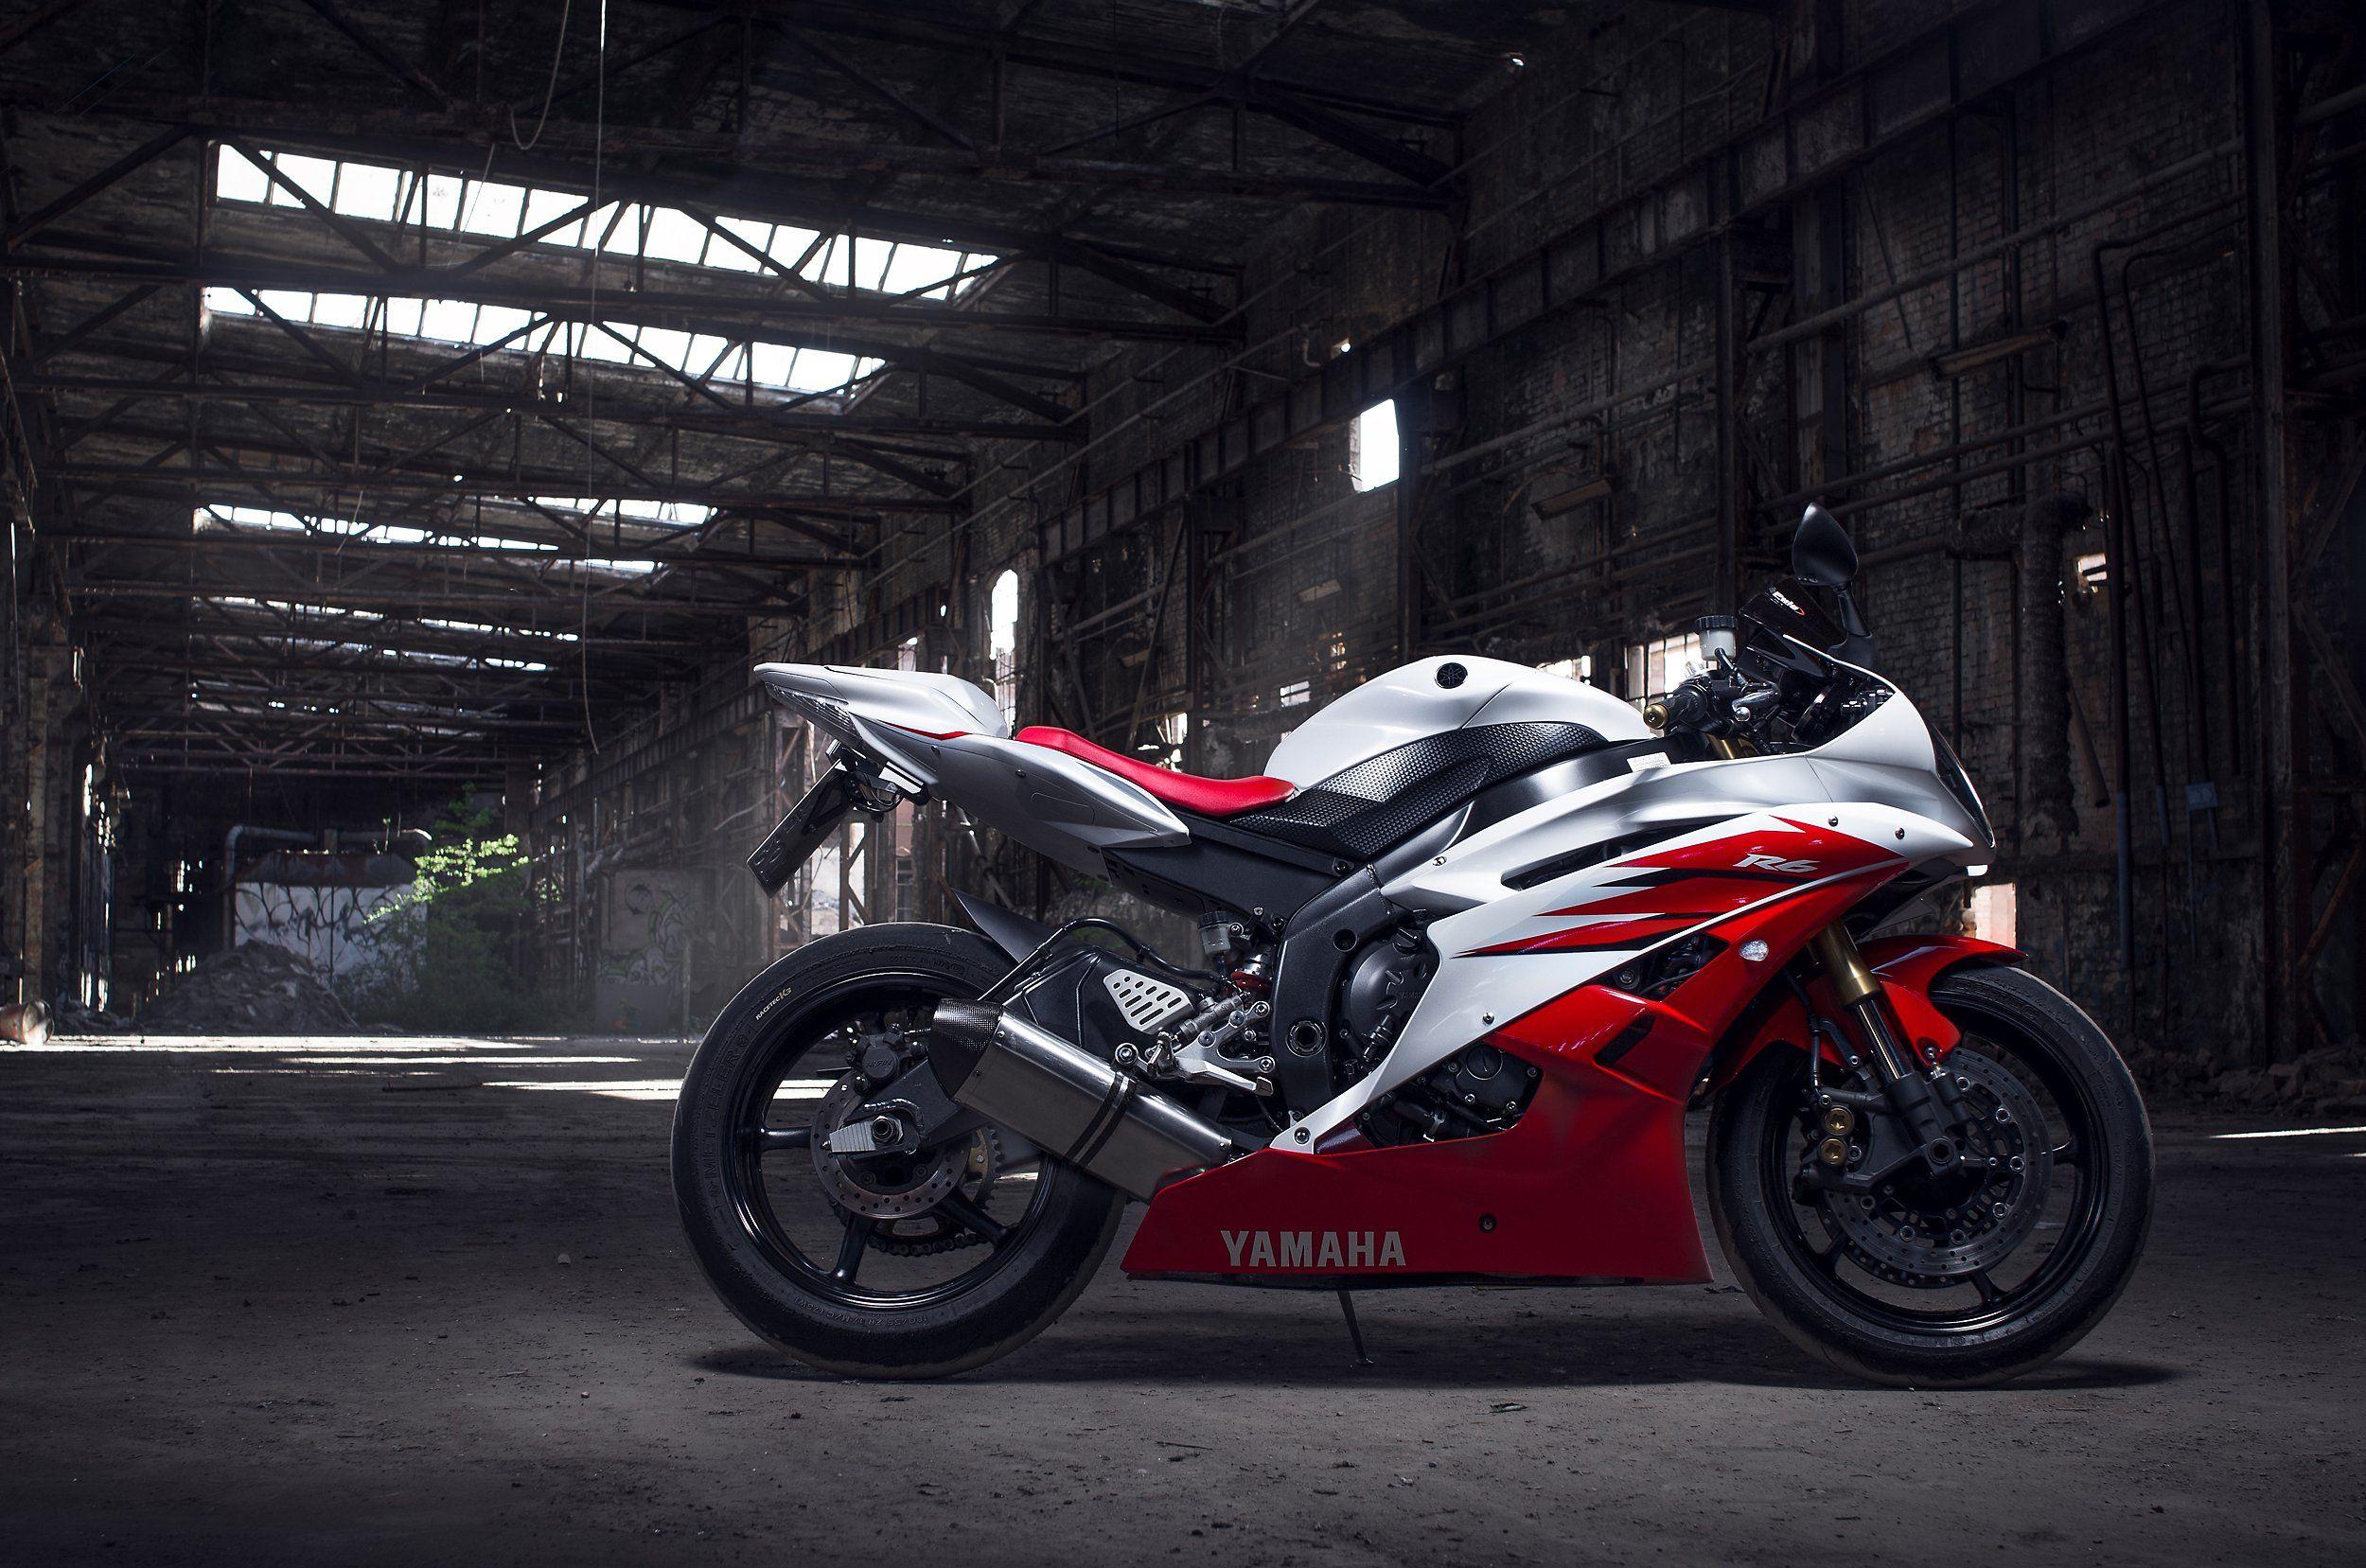 Motorcycles desktop wallpapers Yamaha YZFR6 2015 Adorable